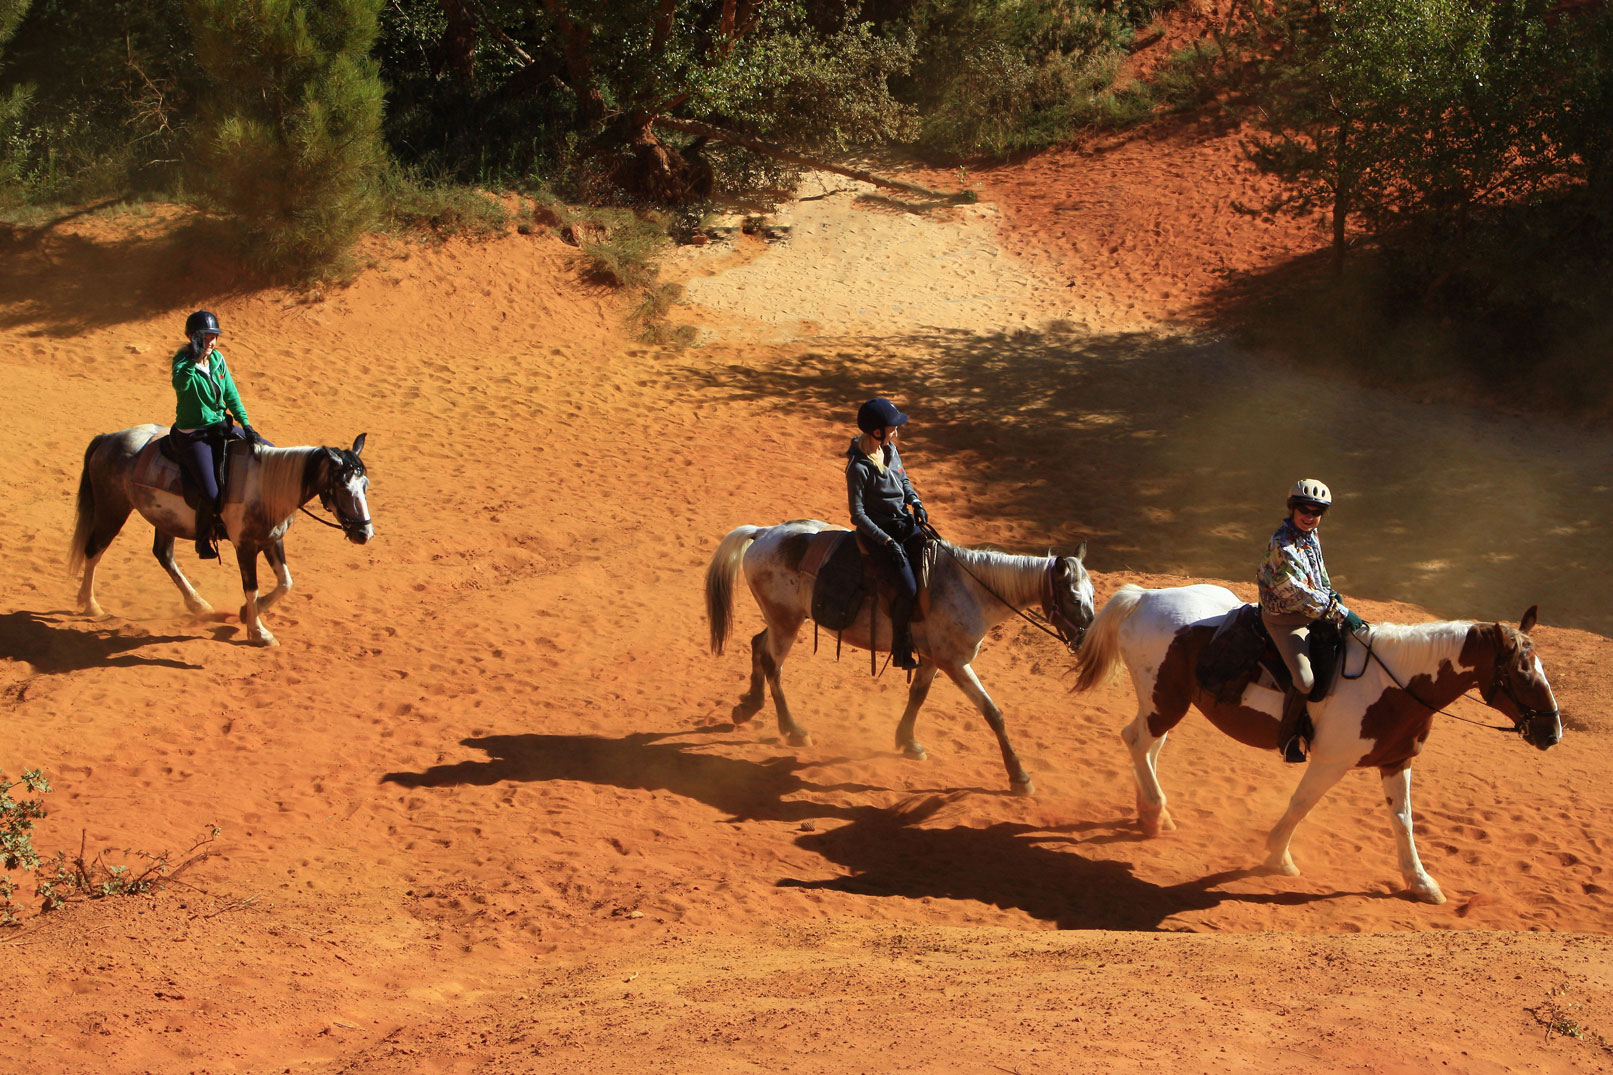 Equestrian centres @ Hocquel